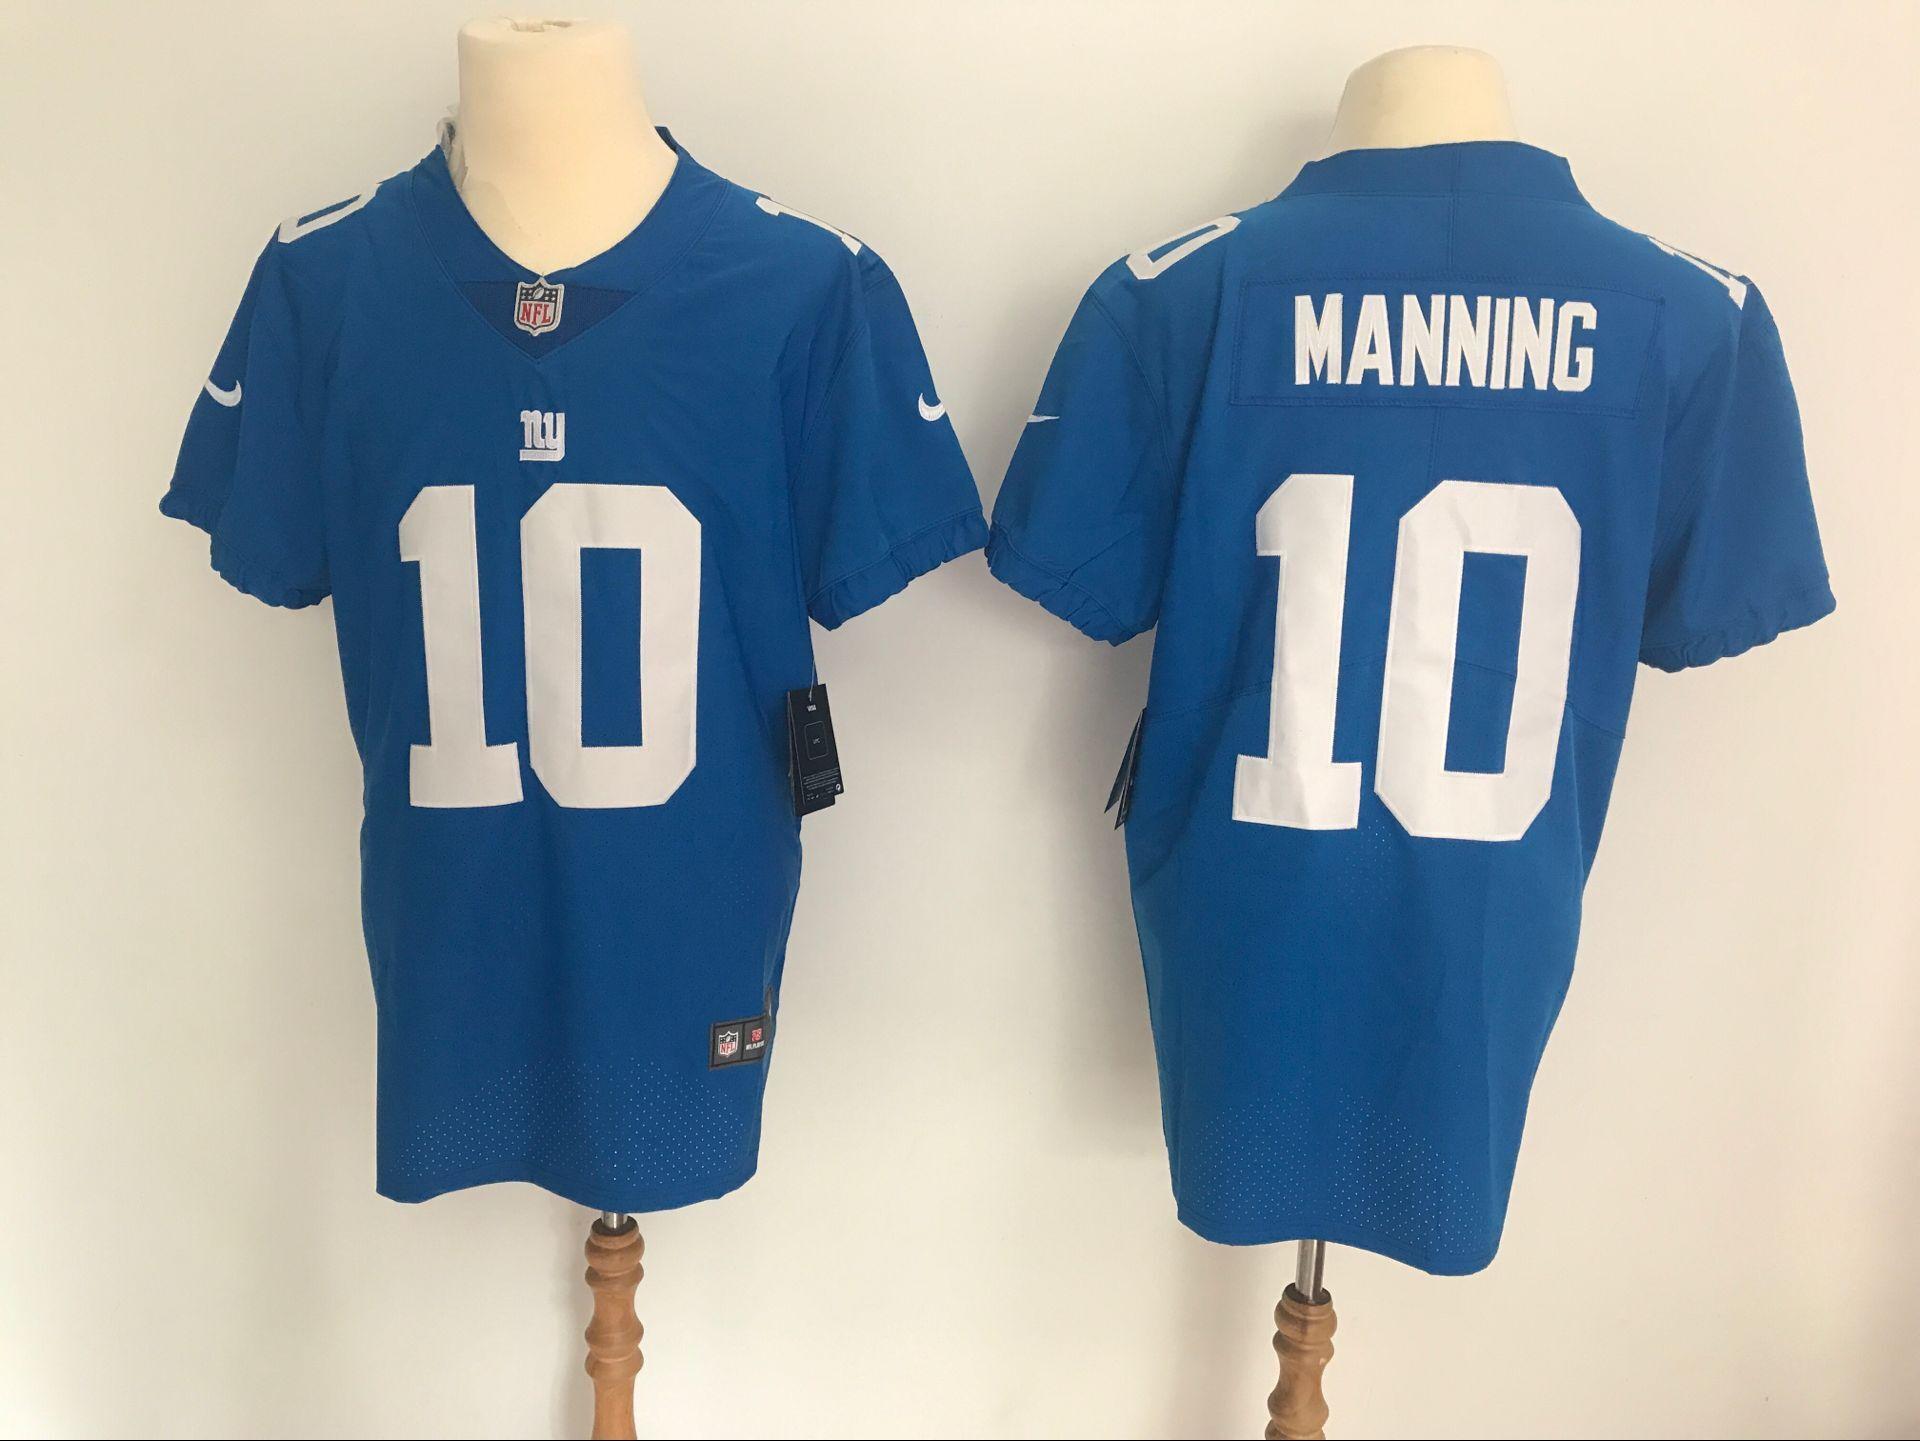 bf2dccbb2 Men's New York Giants #10 Eli Manning Blue Vapor Untouchable Elite Stitched  NFL Jersey